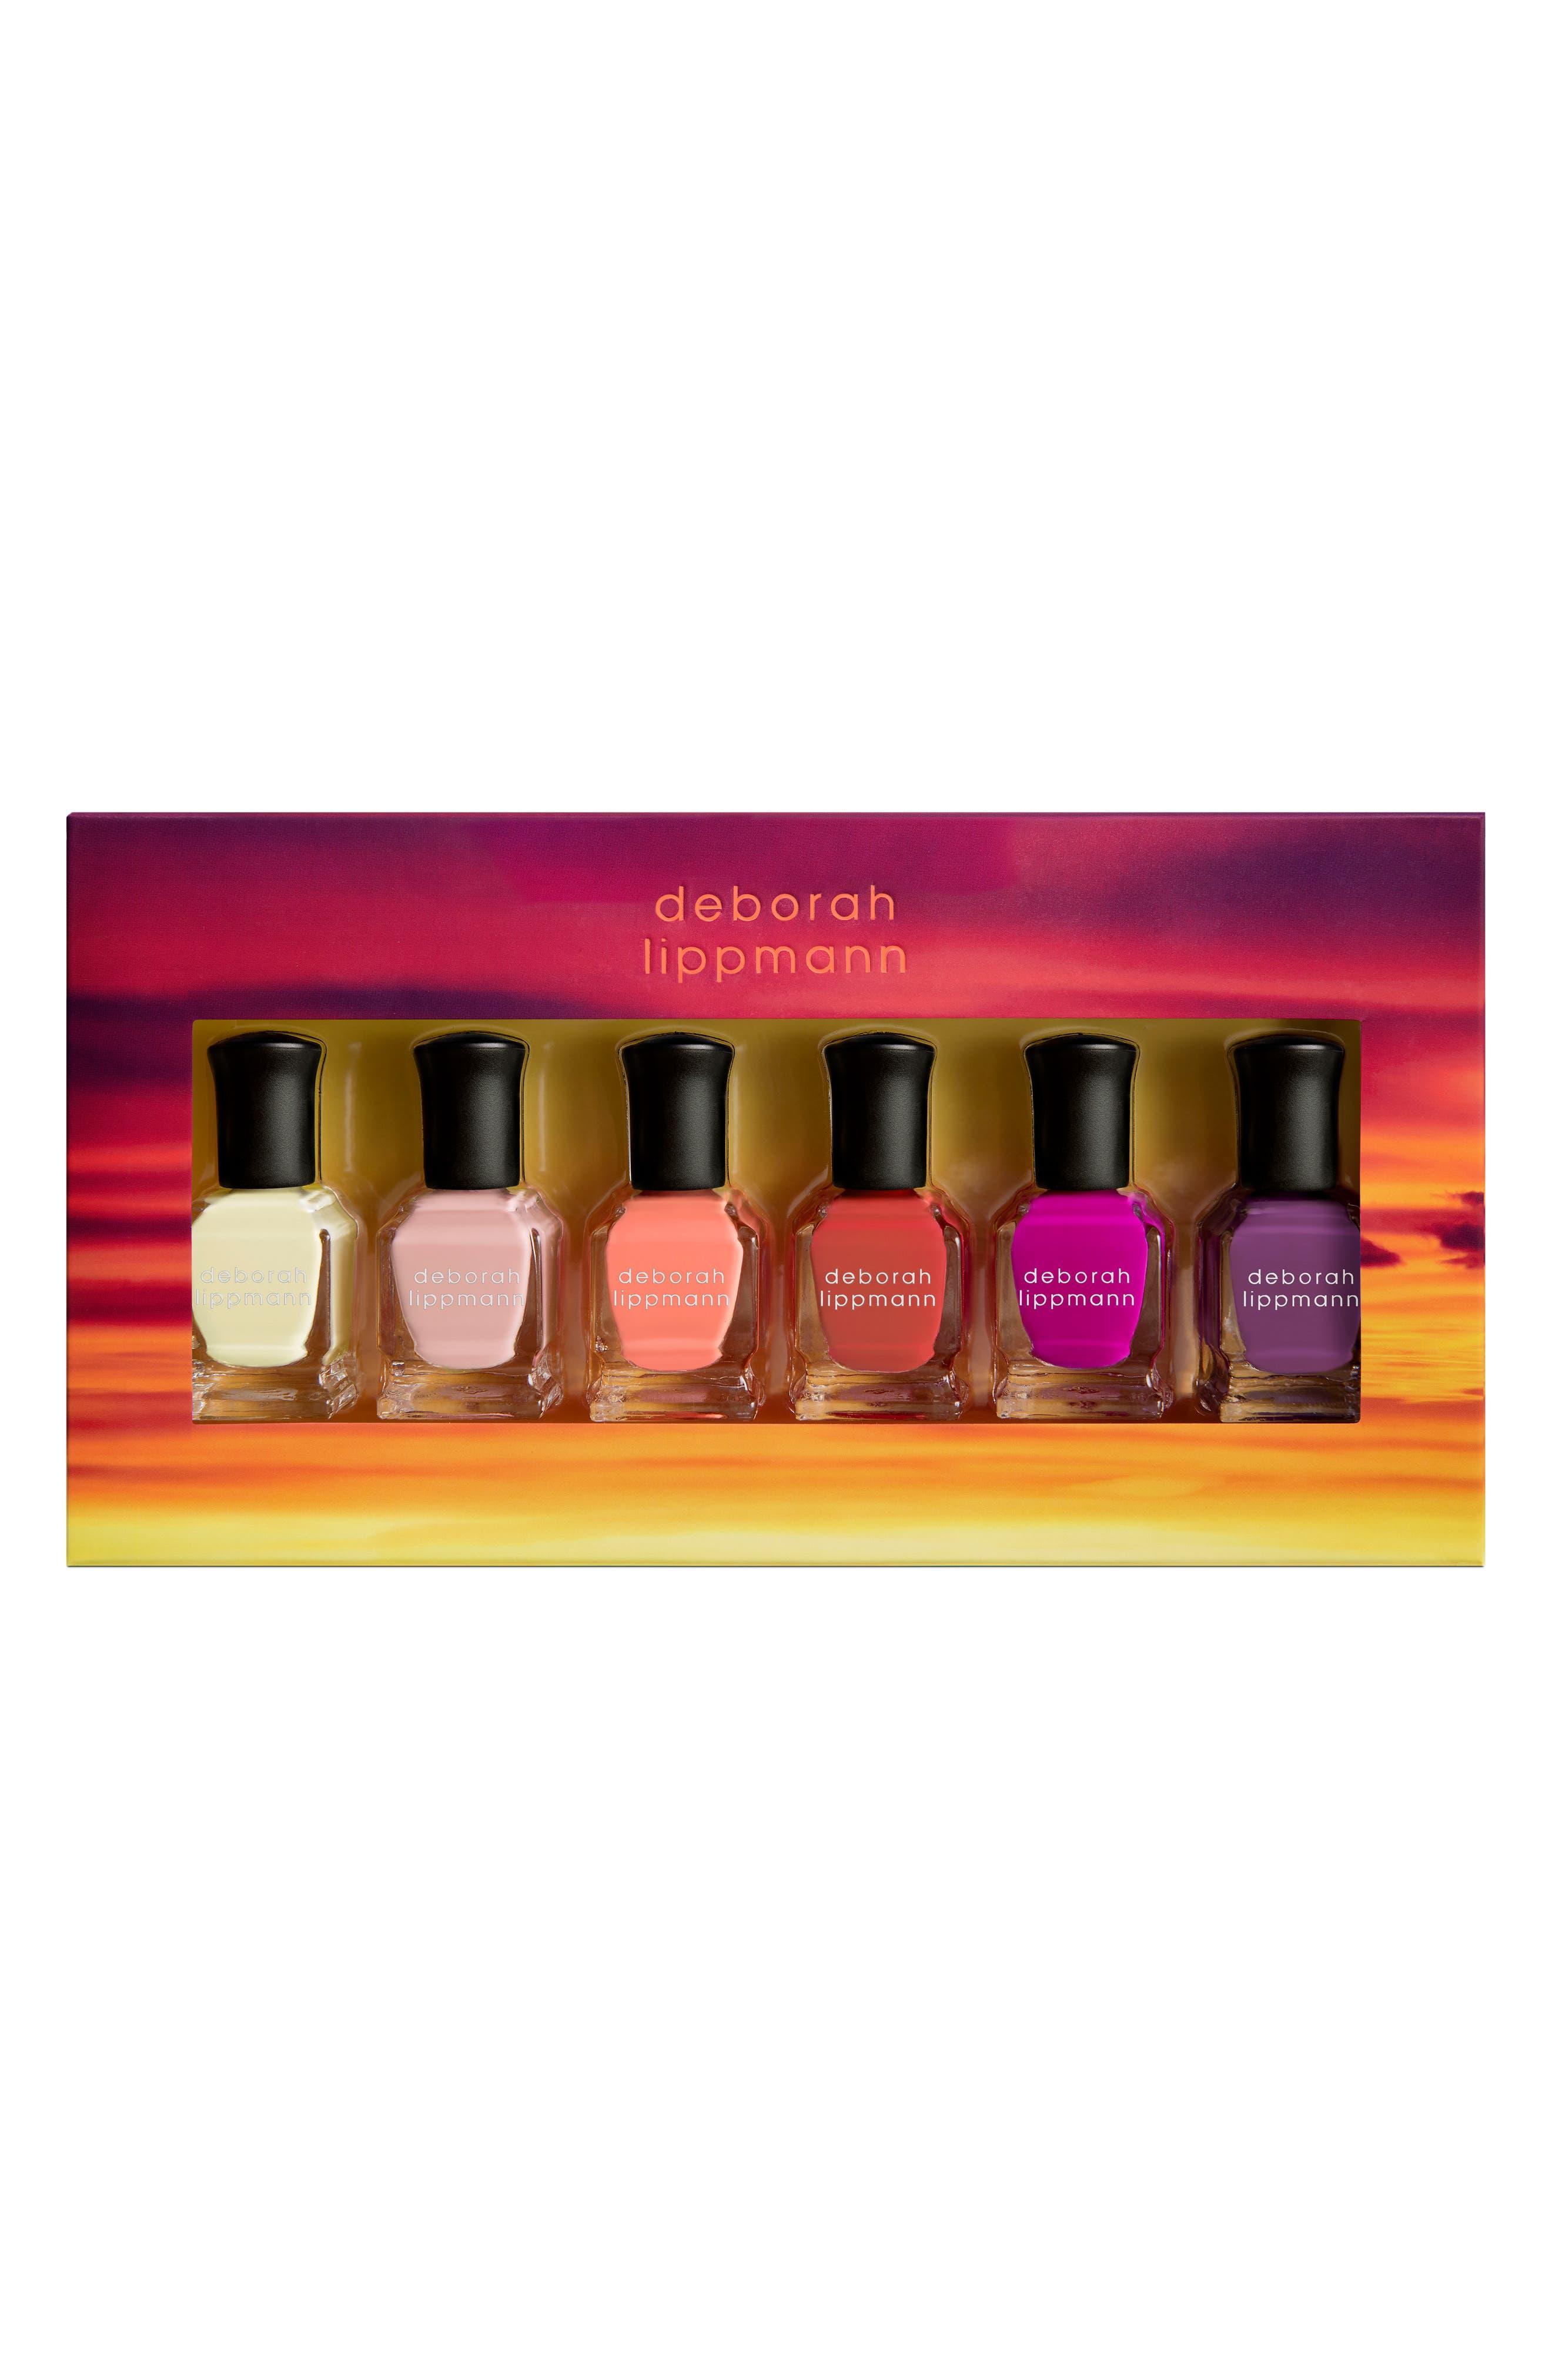 Deborah Lippmann Sunrise Sunset Gel Lab Pro Nail Color Set ($72 Value)